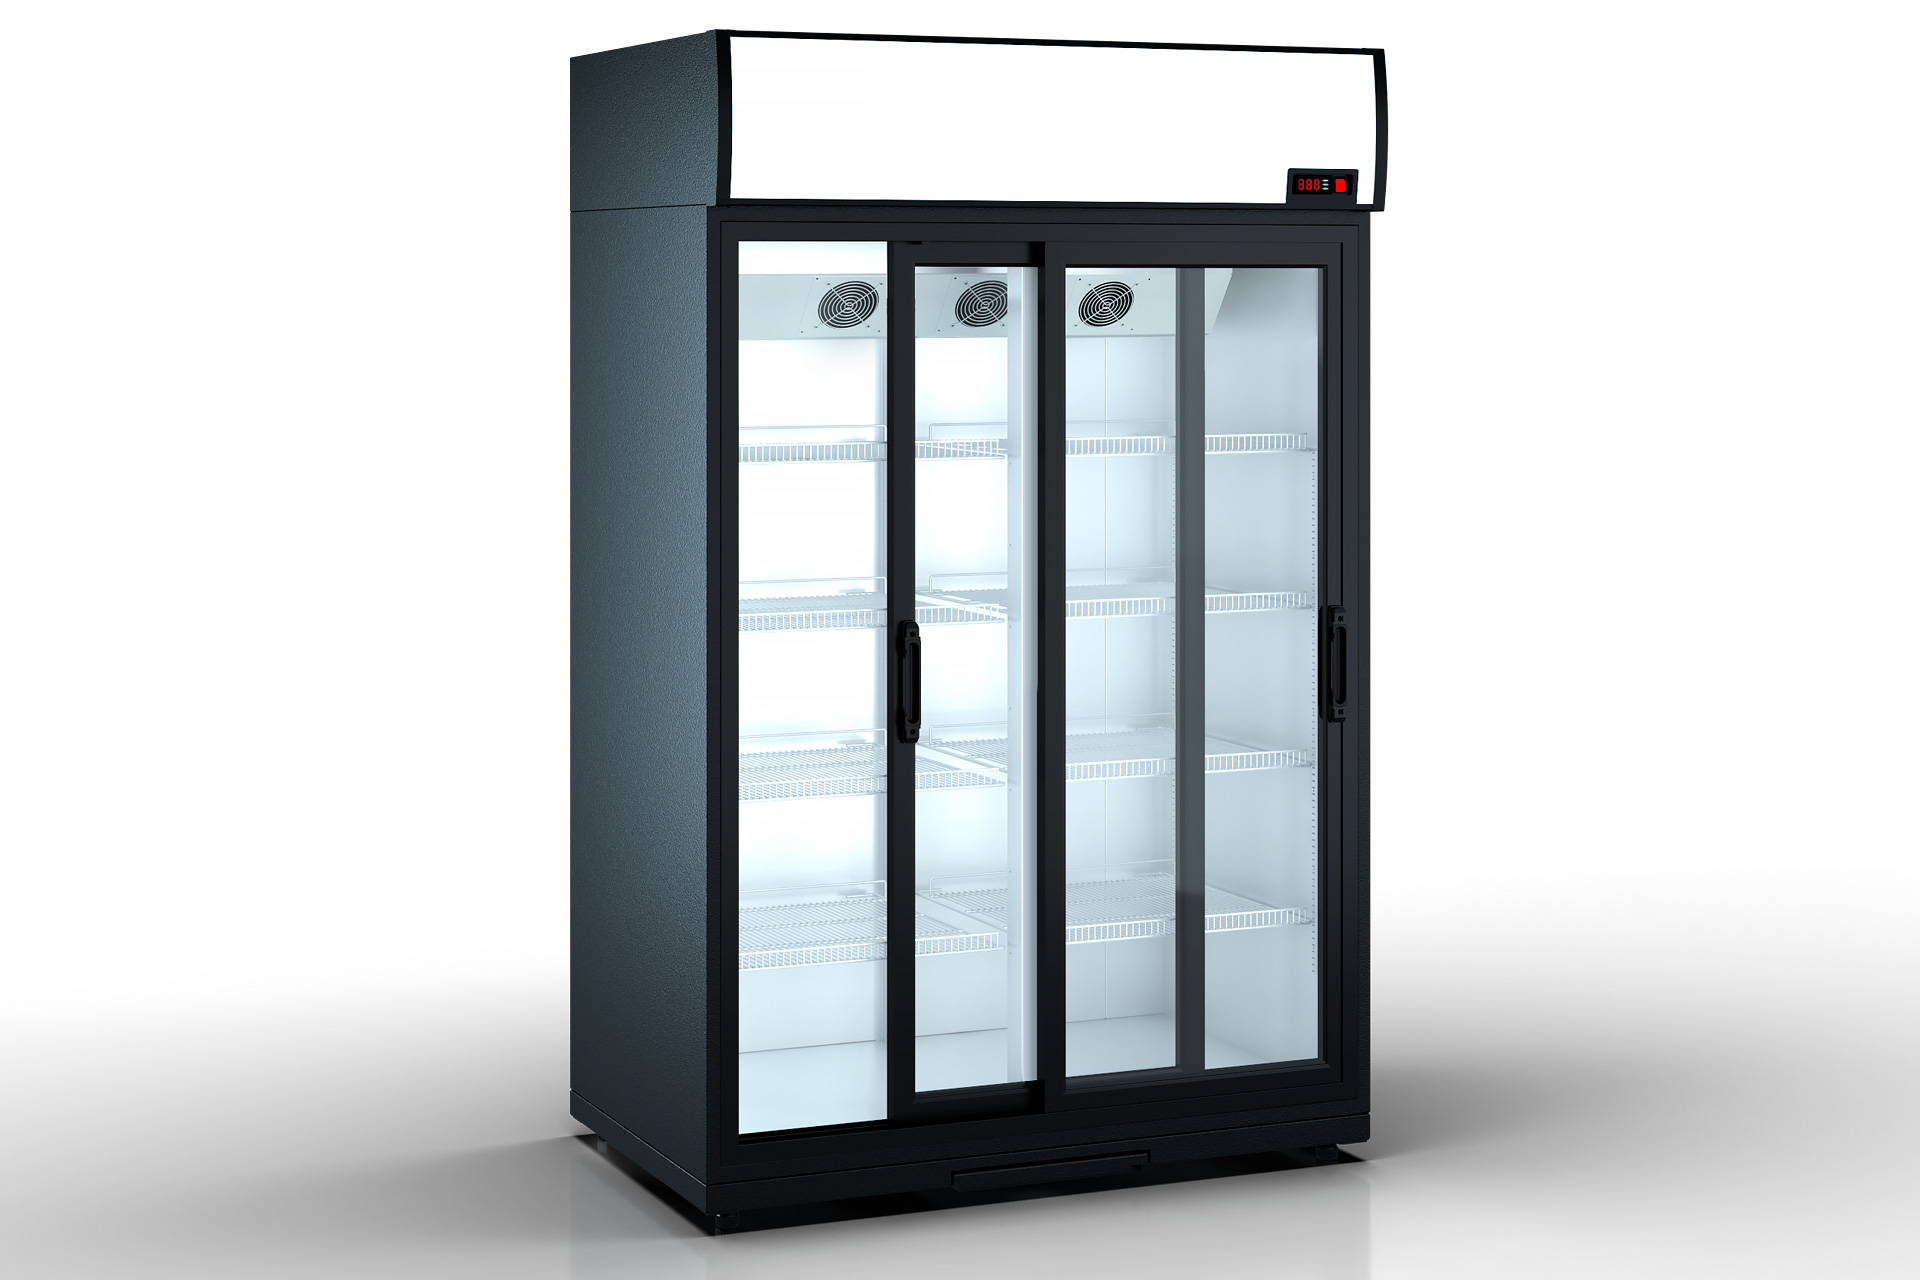 Refrigerated cabinets Kansas VА1SG 050 HT SD 210-D800A-132